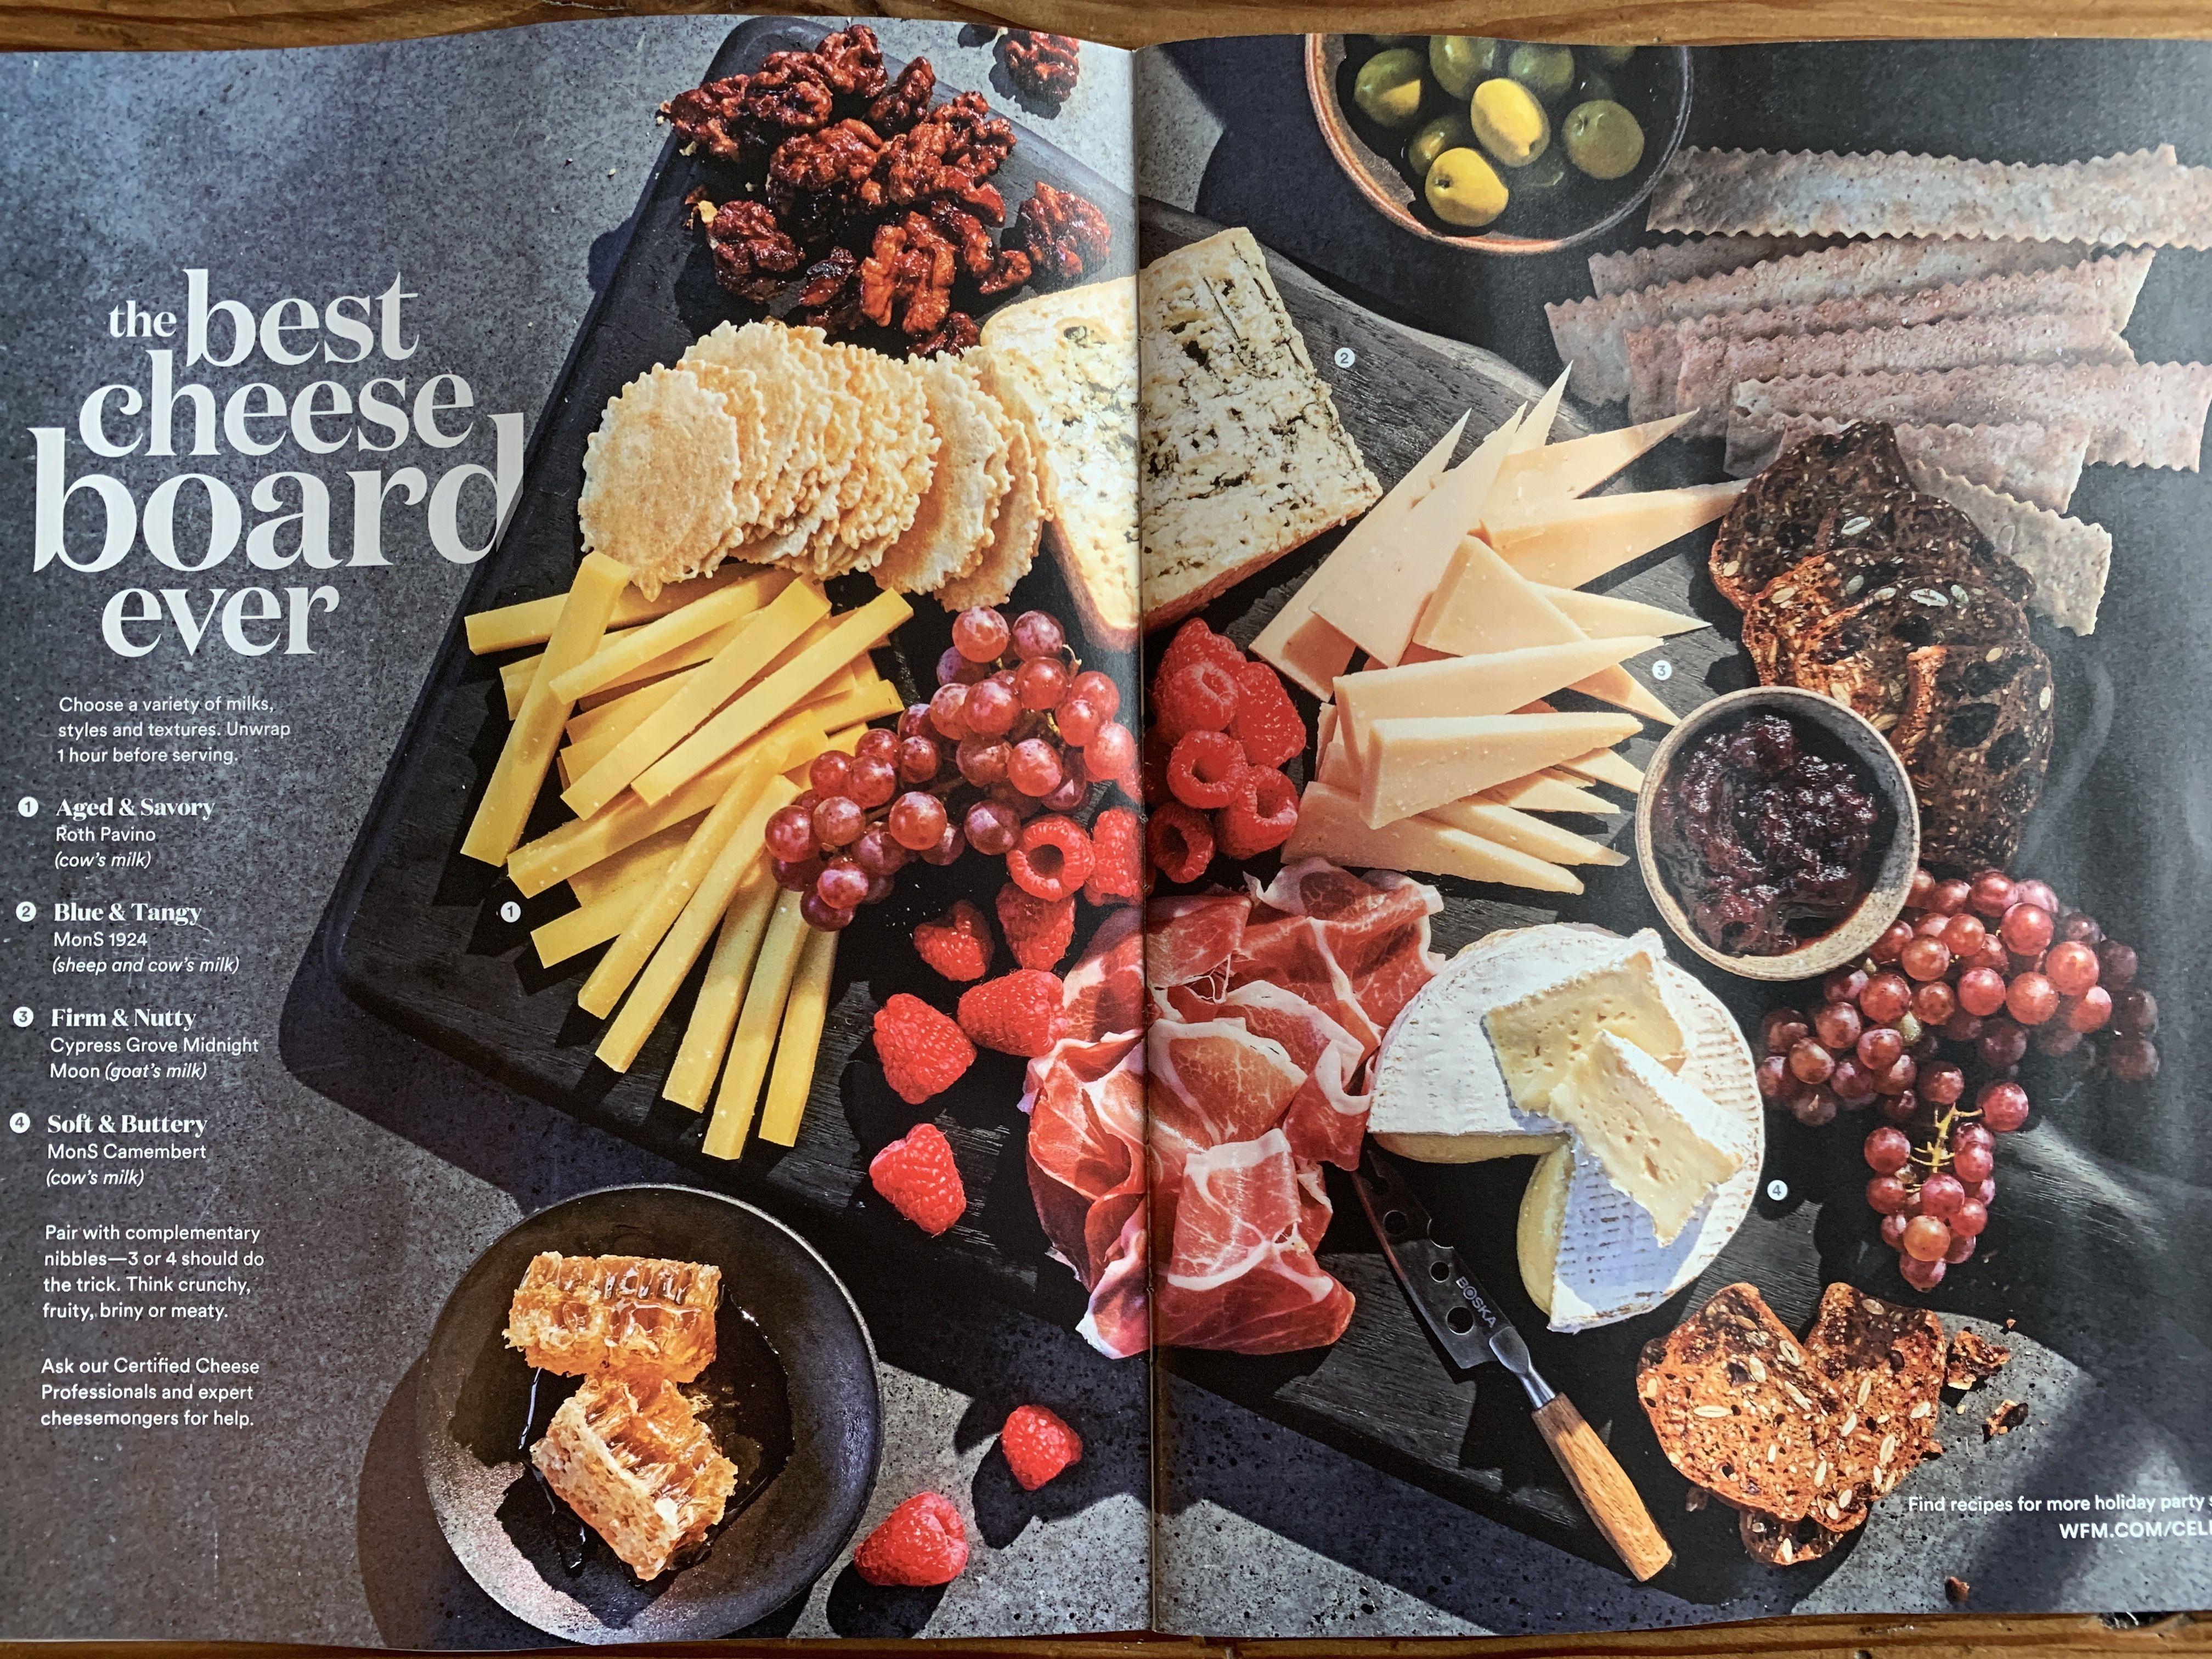 Holiday Recipes Whole Foods Market Food Whole Food Recipes Whole Foods Market